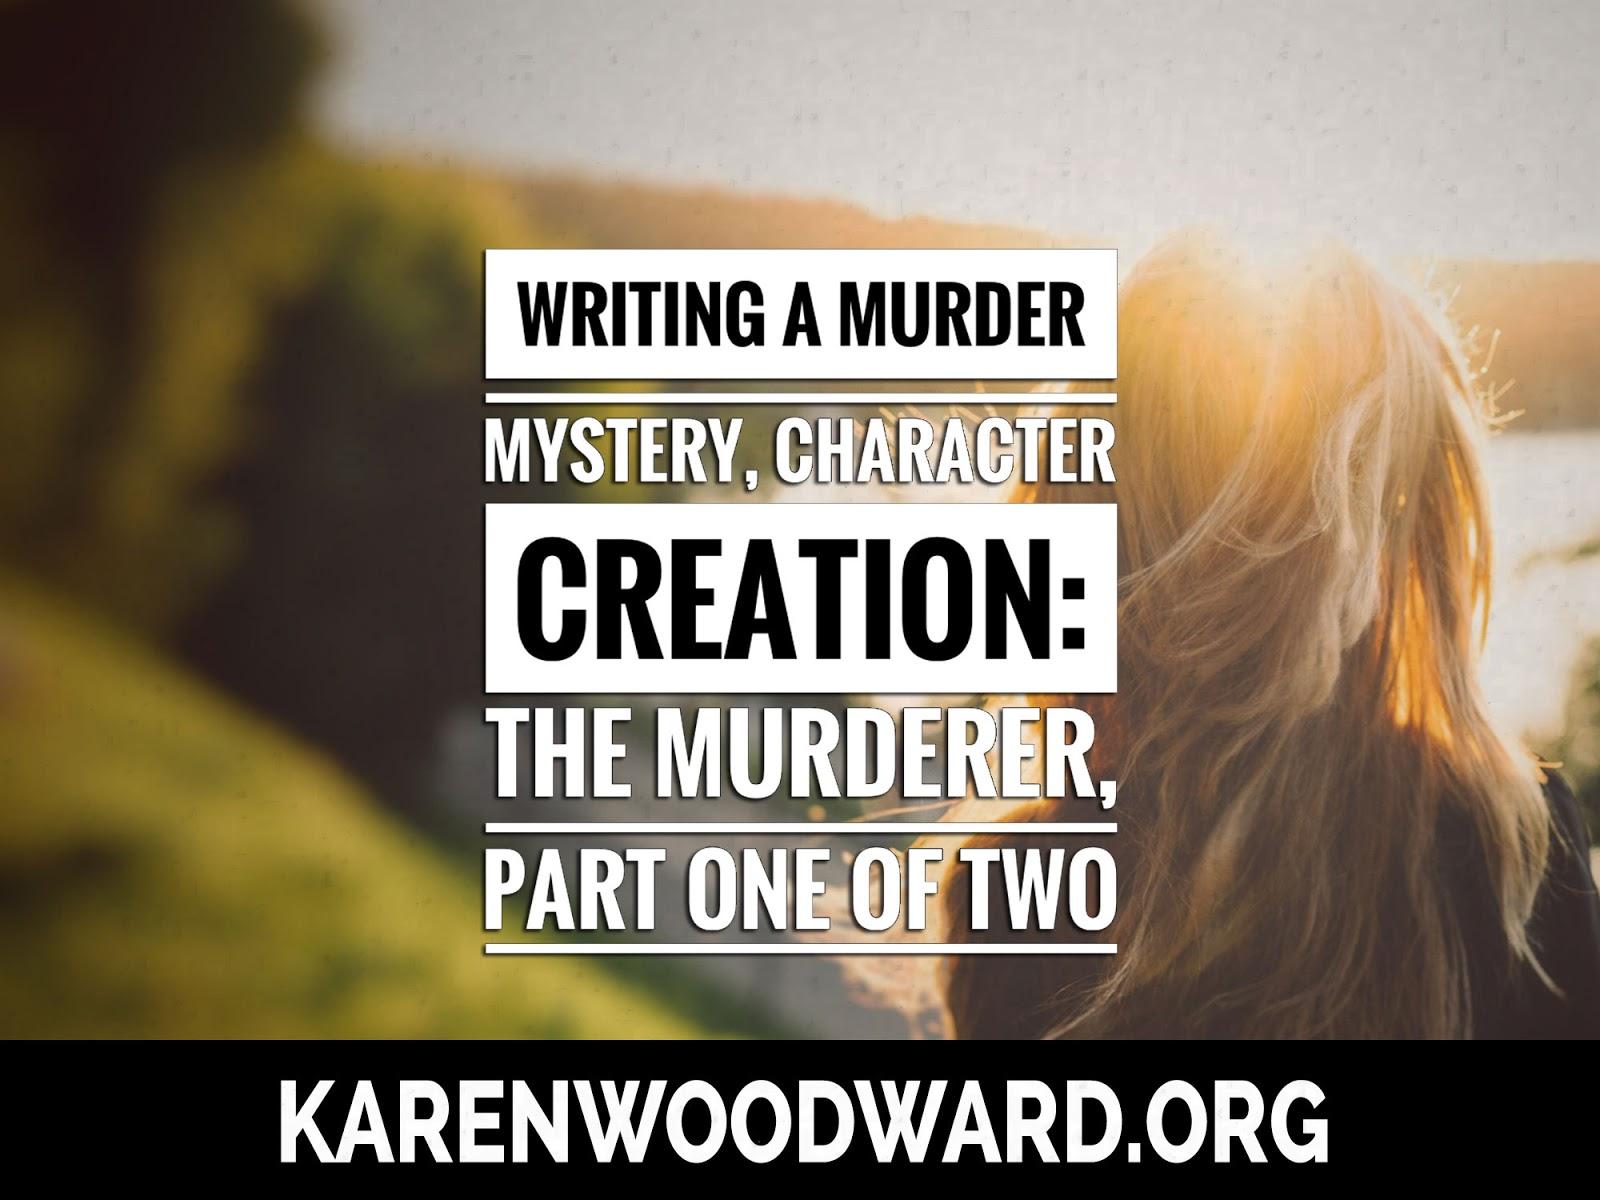 Karen Woodward: Writing a Murder Mystery, Character Creation